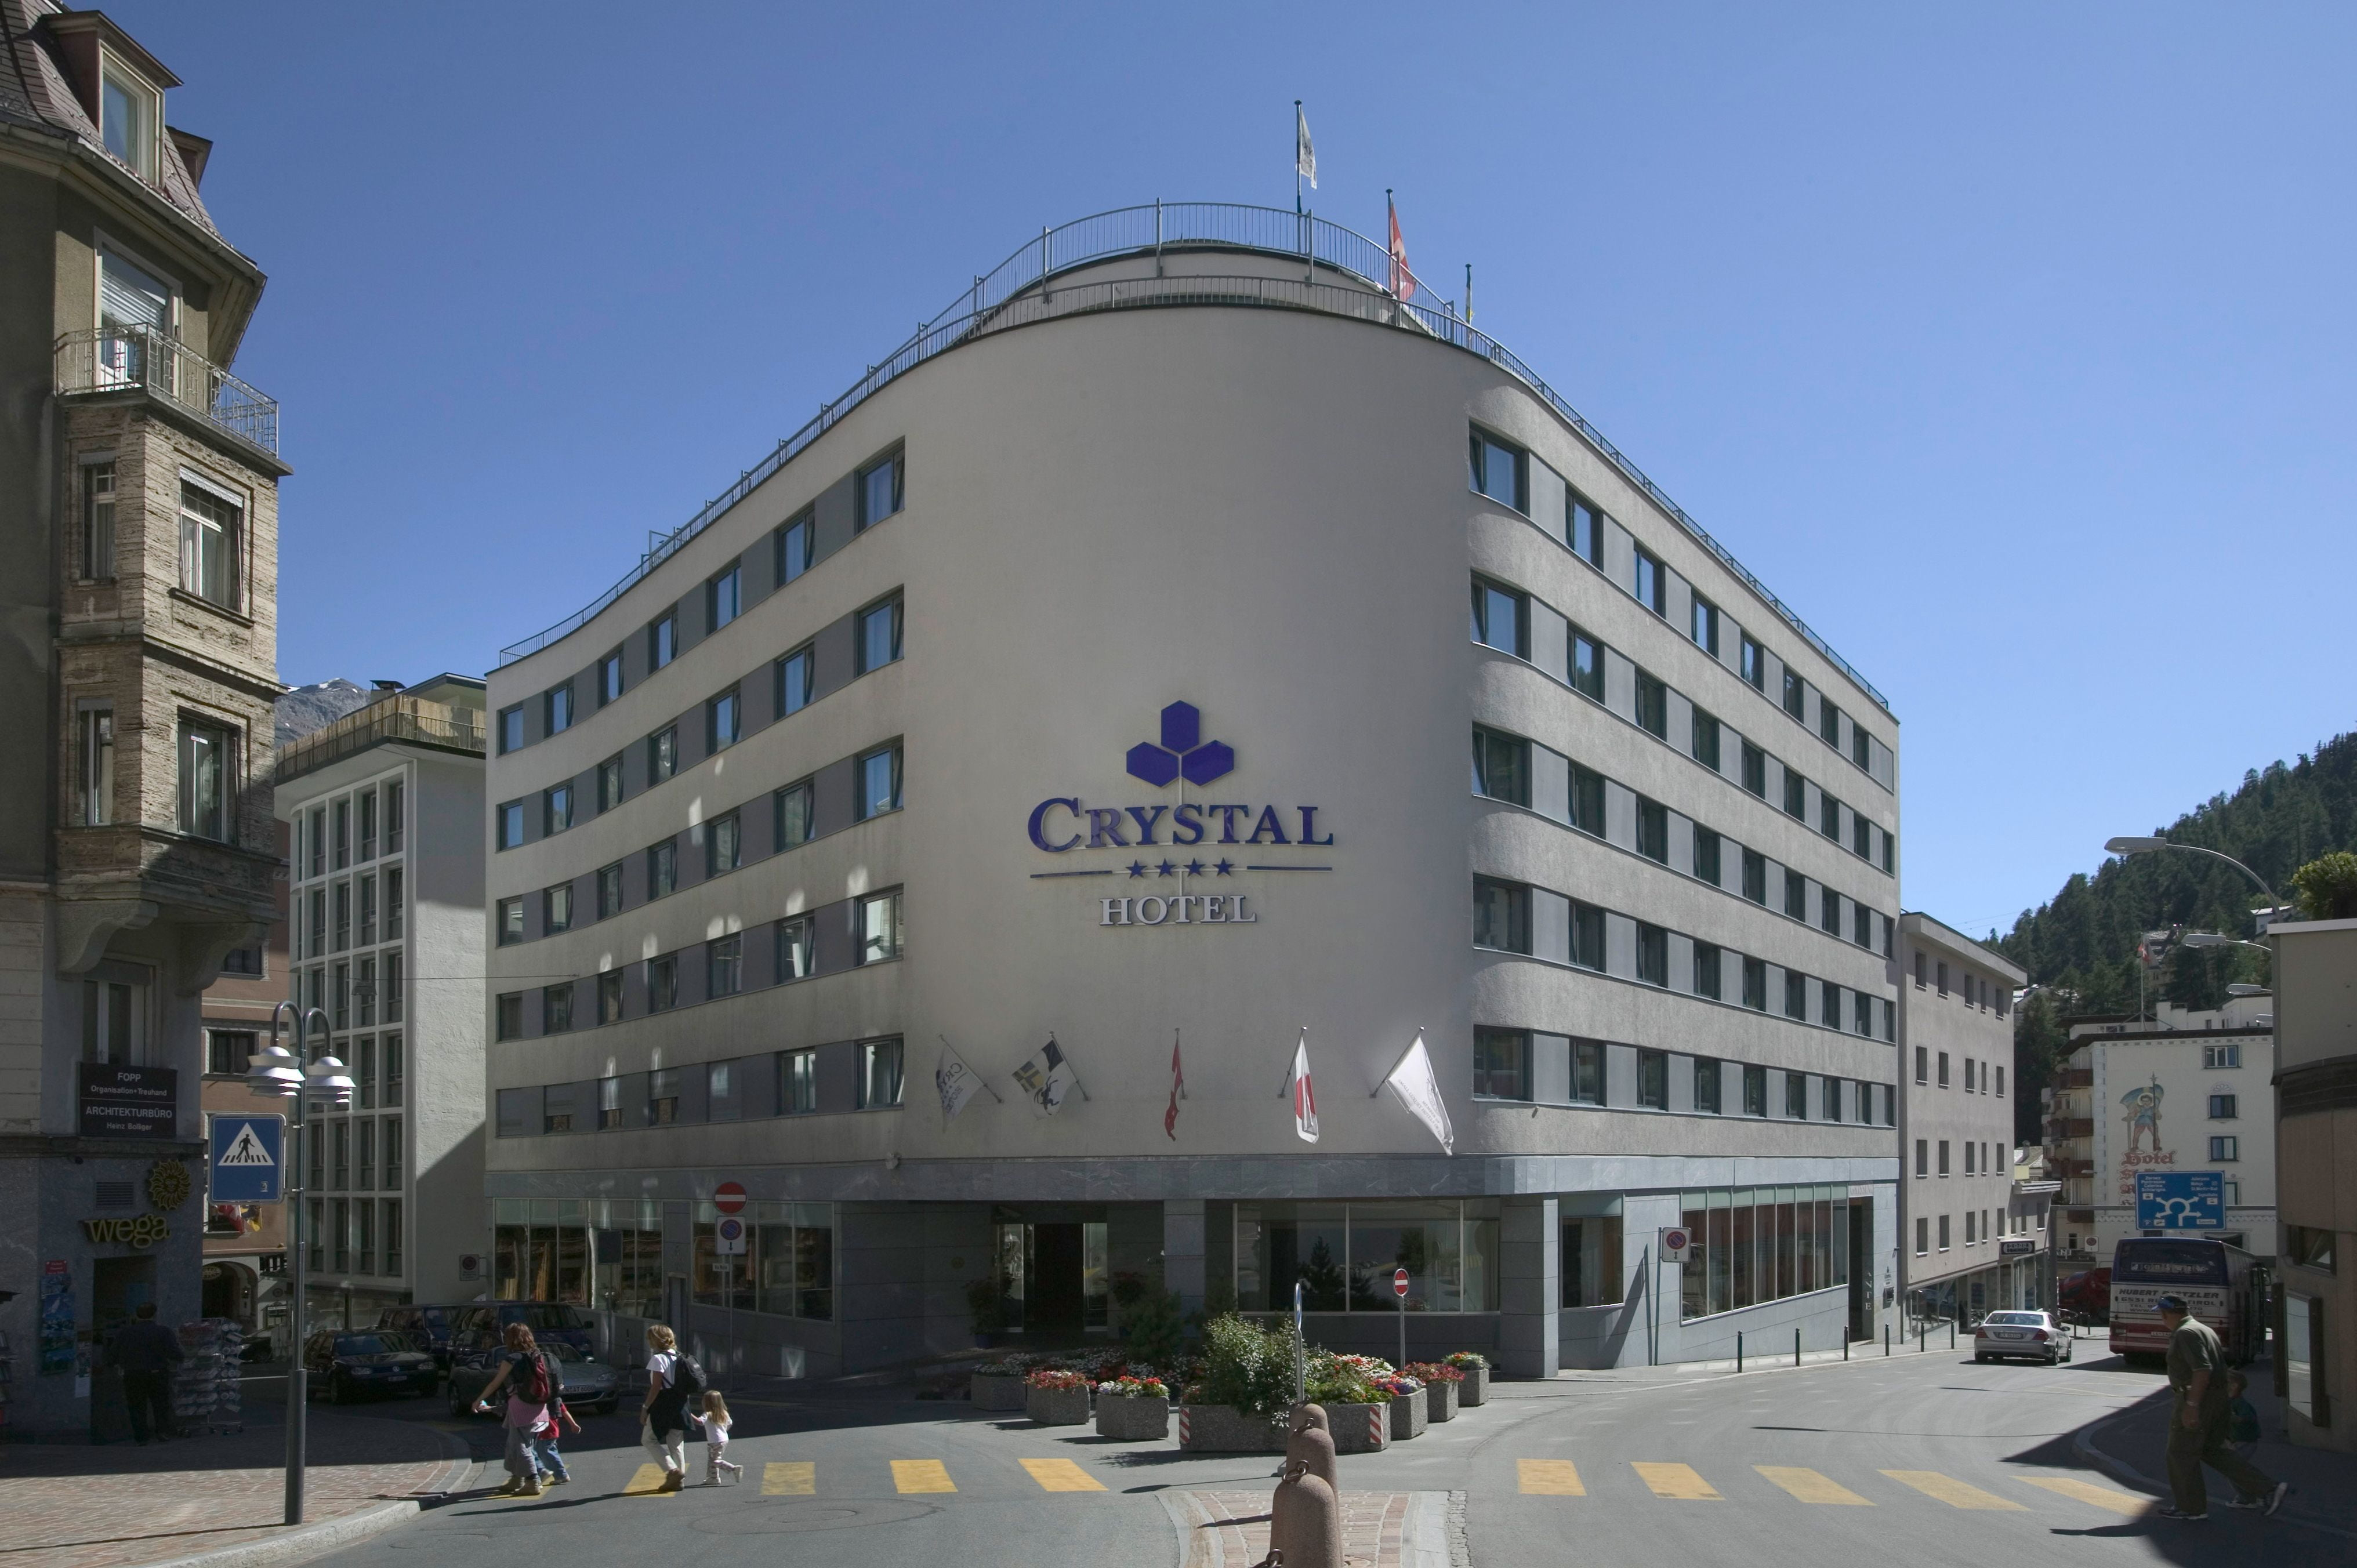 Hotel Crystal, St. Moritz